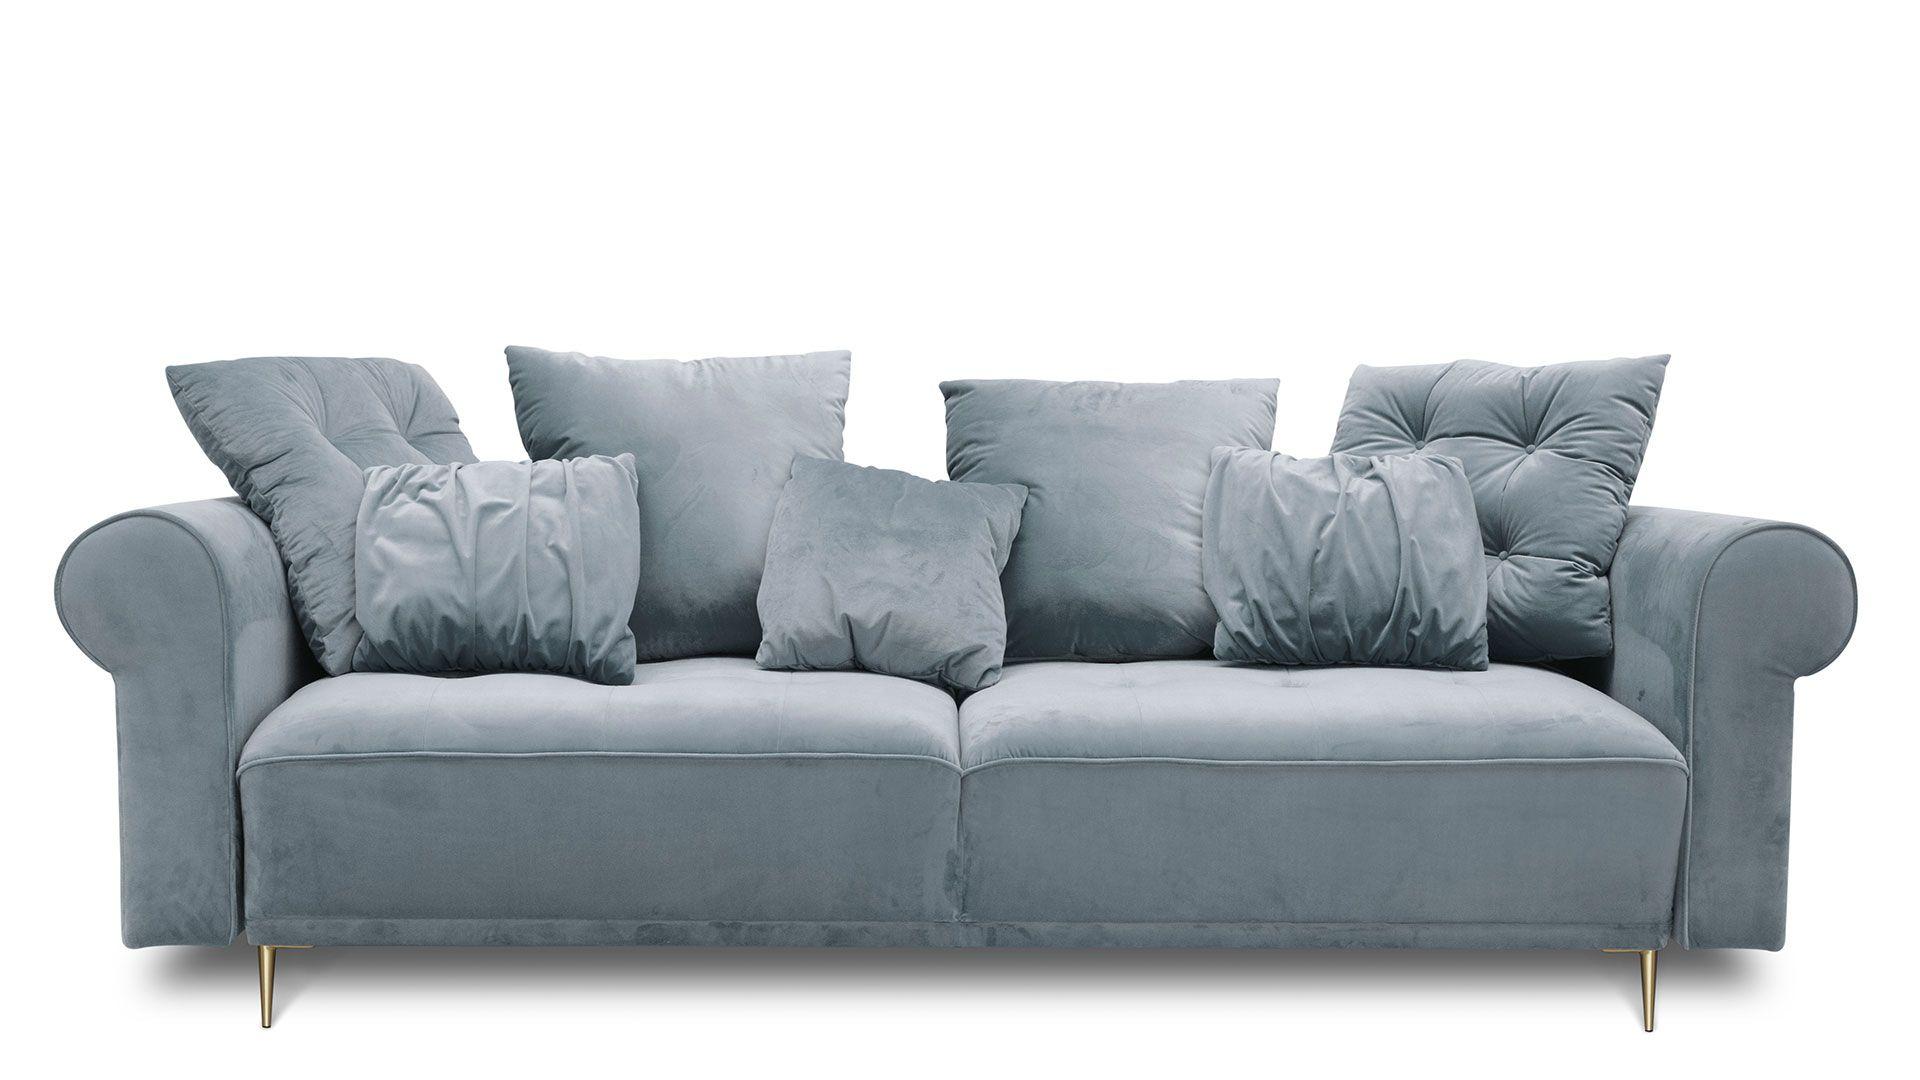 Sofa z funkcją spania Clair